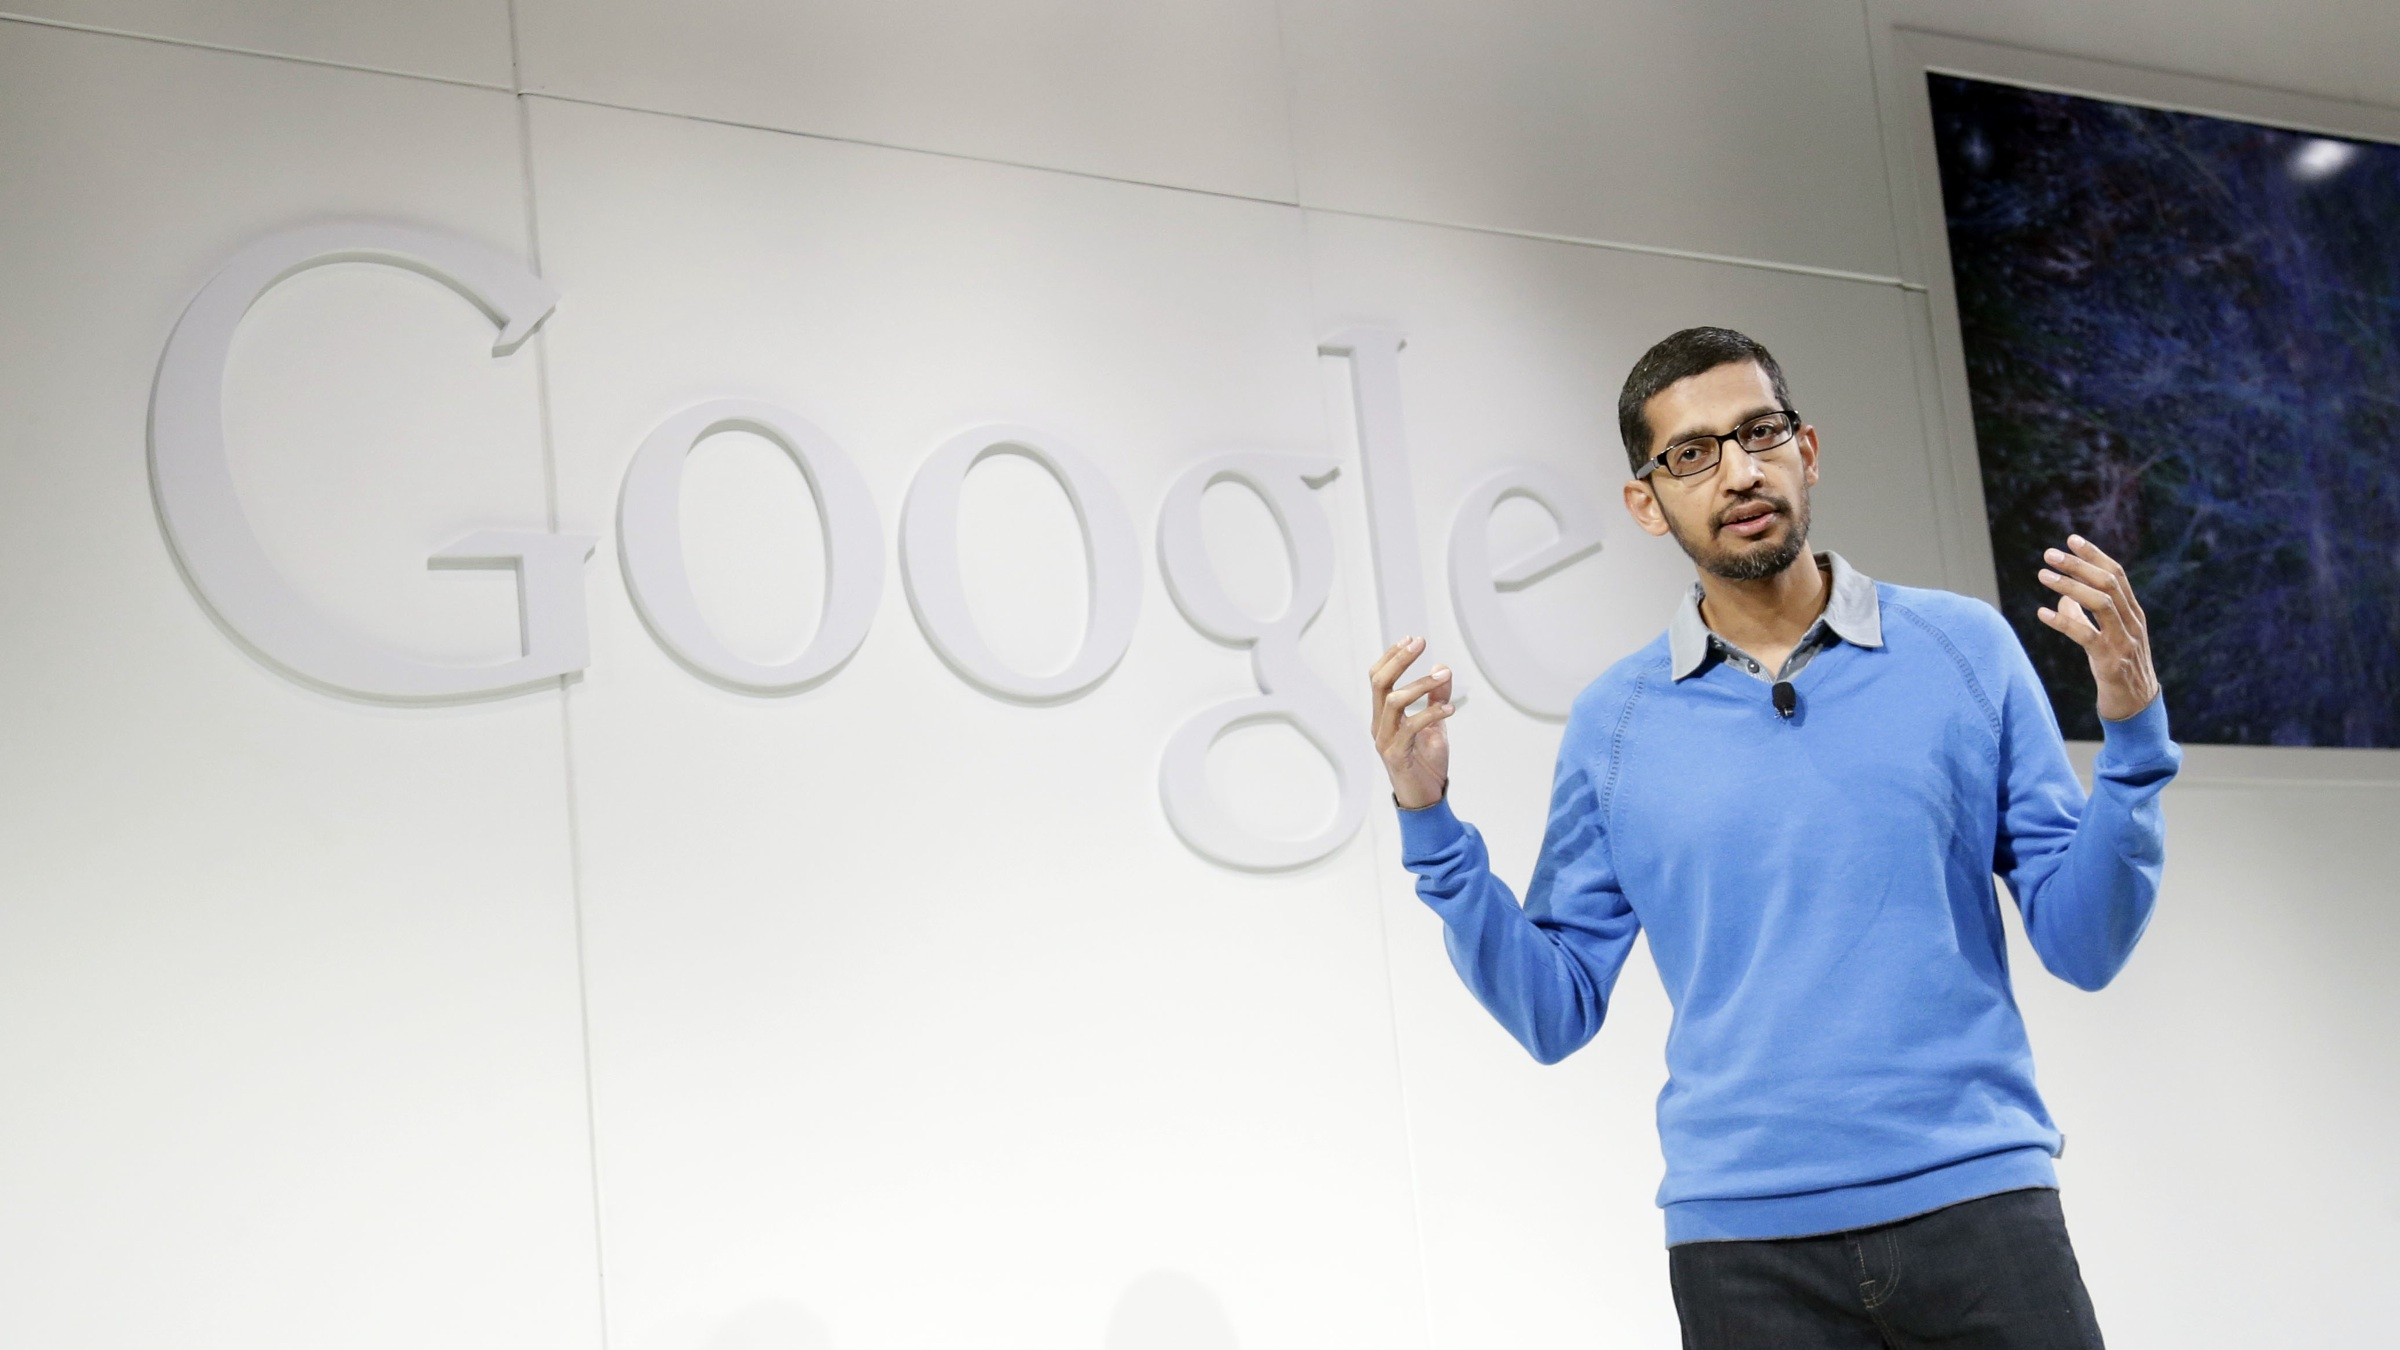 Sundar Pichai, senior vice president Chrome and apps for Google, speaks on Wednesday, July 24, 2013, in San Francisco. (AP Photo/Marcio Jose Sanchez)